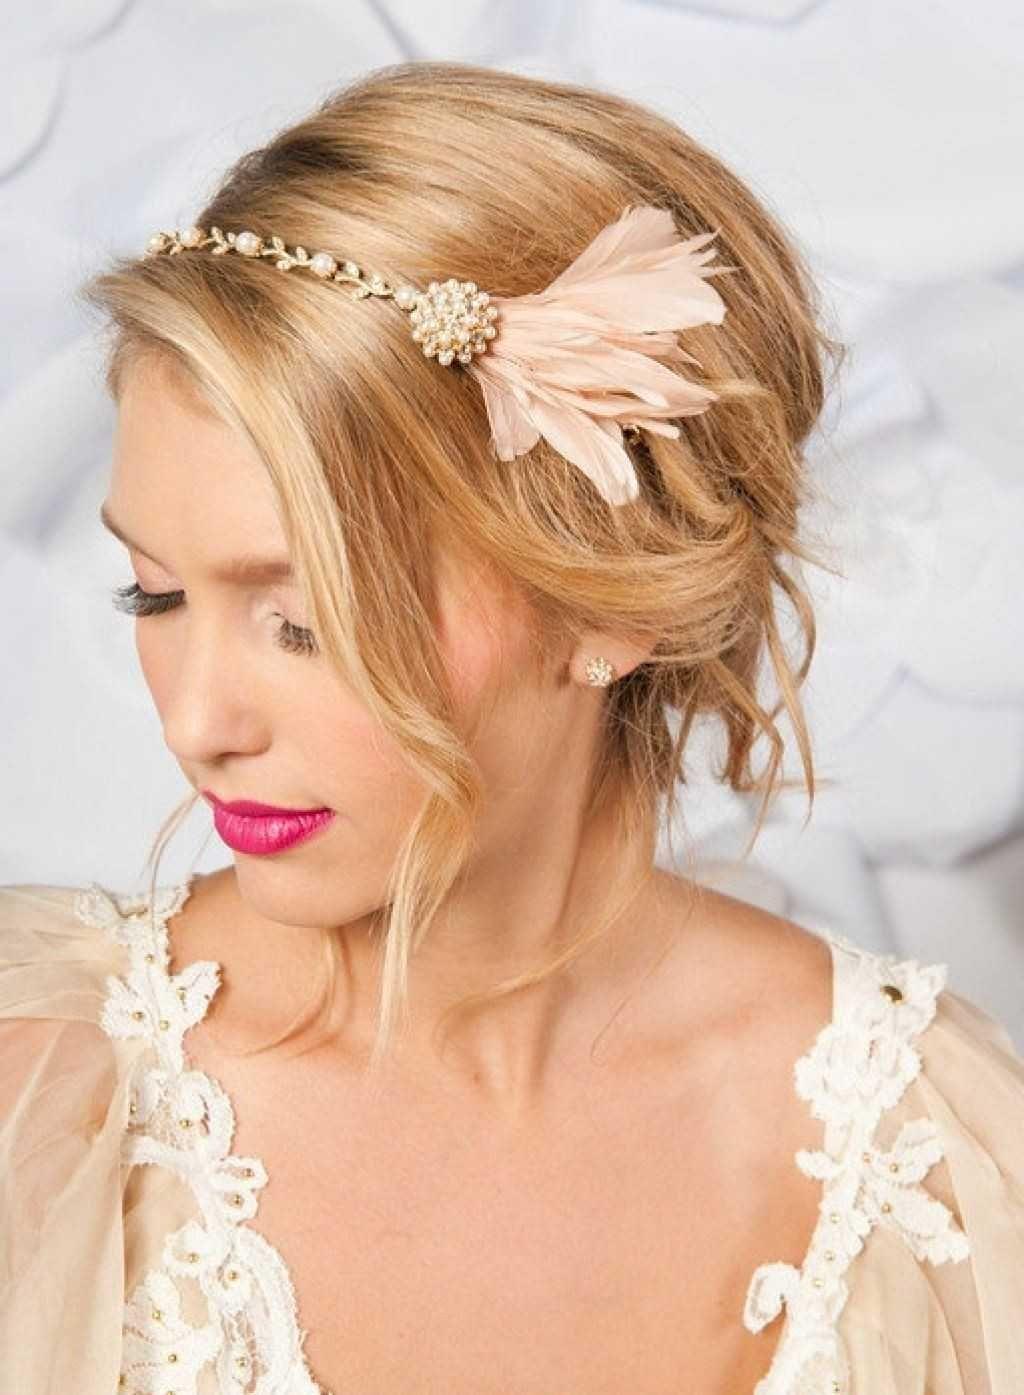 Headband wedding hairstyle :: one1lady.com :: #hair #hairs #hairstyle #hairstyles